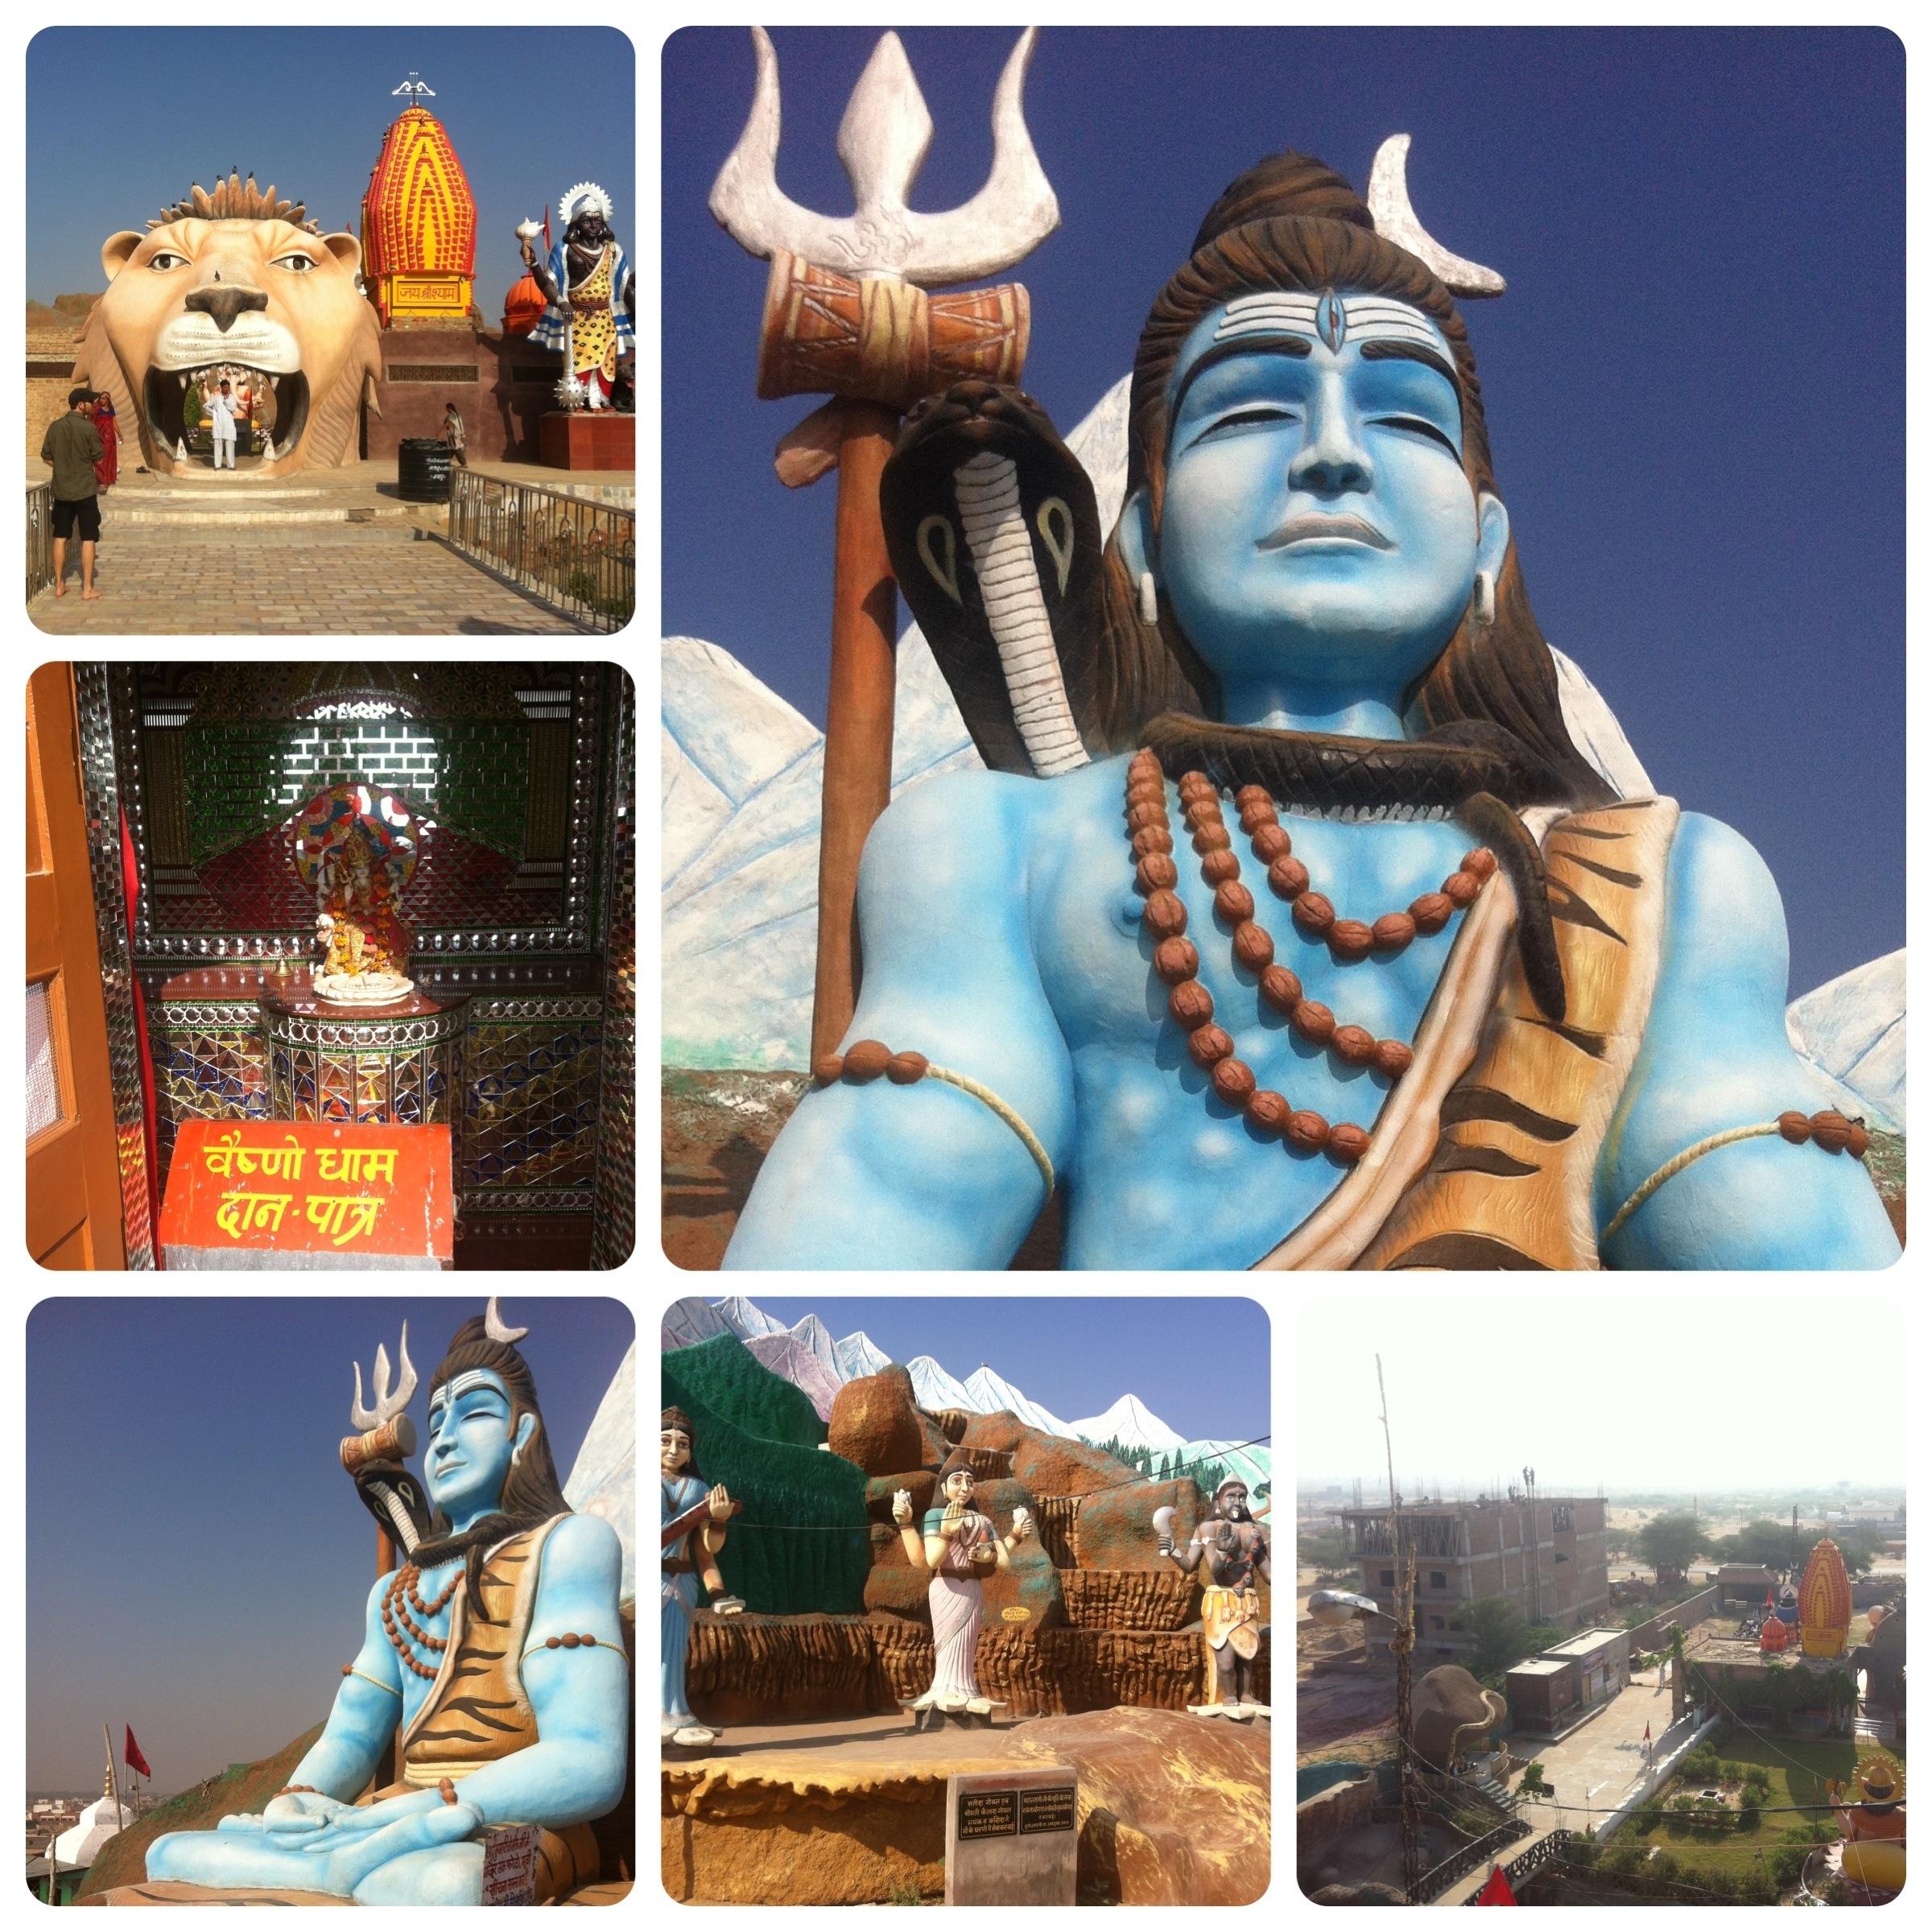 Tempel, Mandawa und noch mehr Havelis.